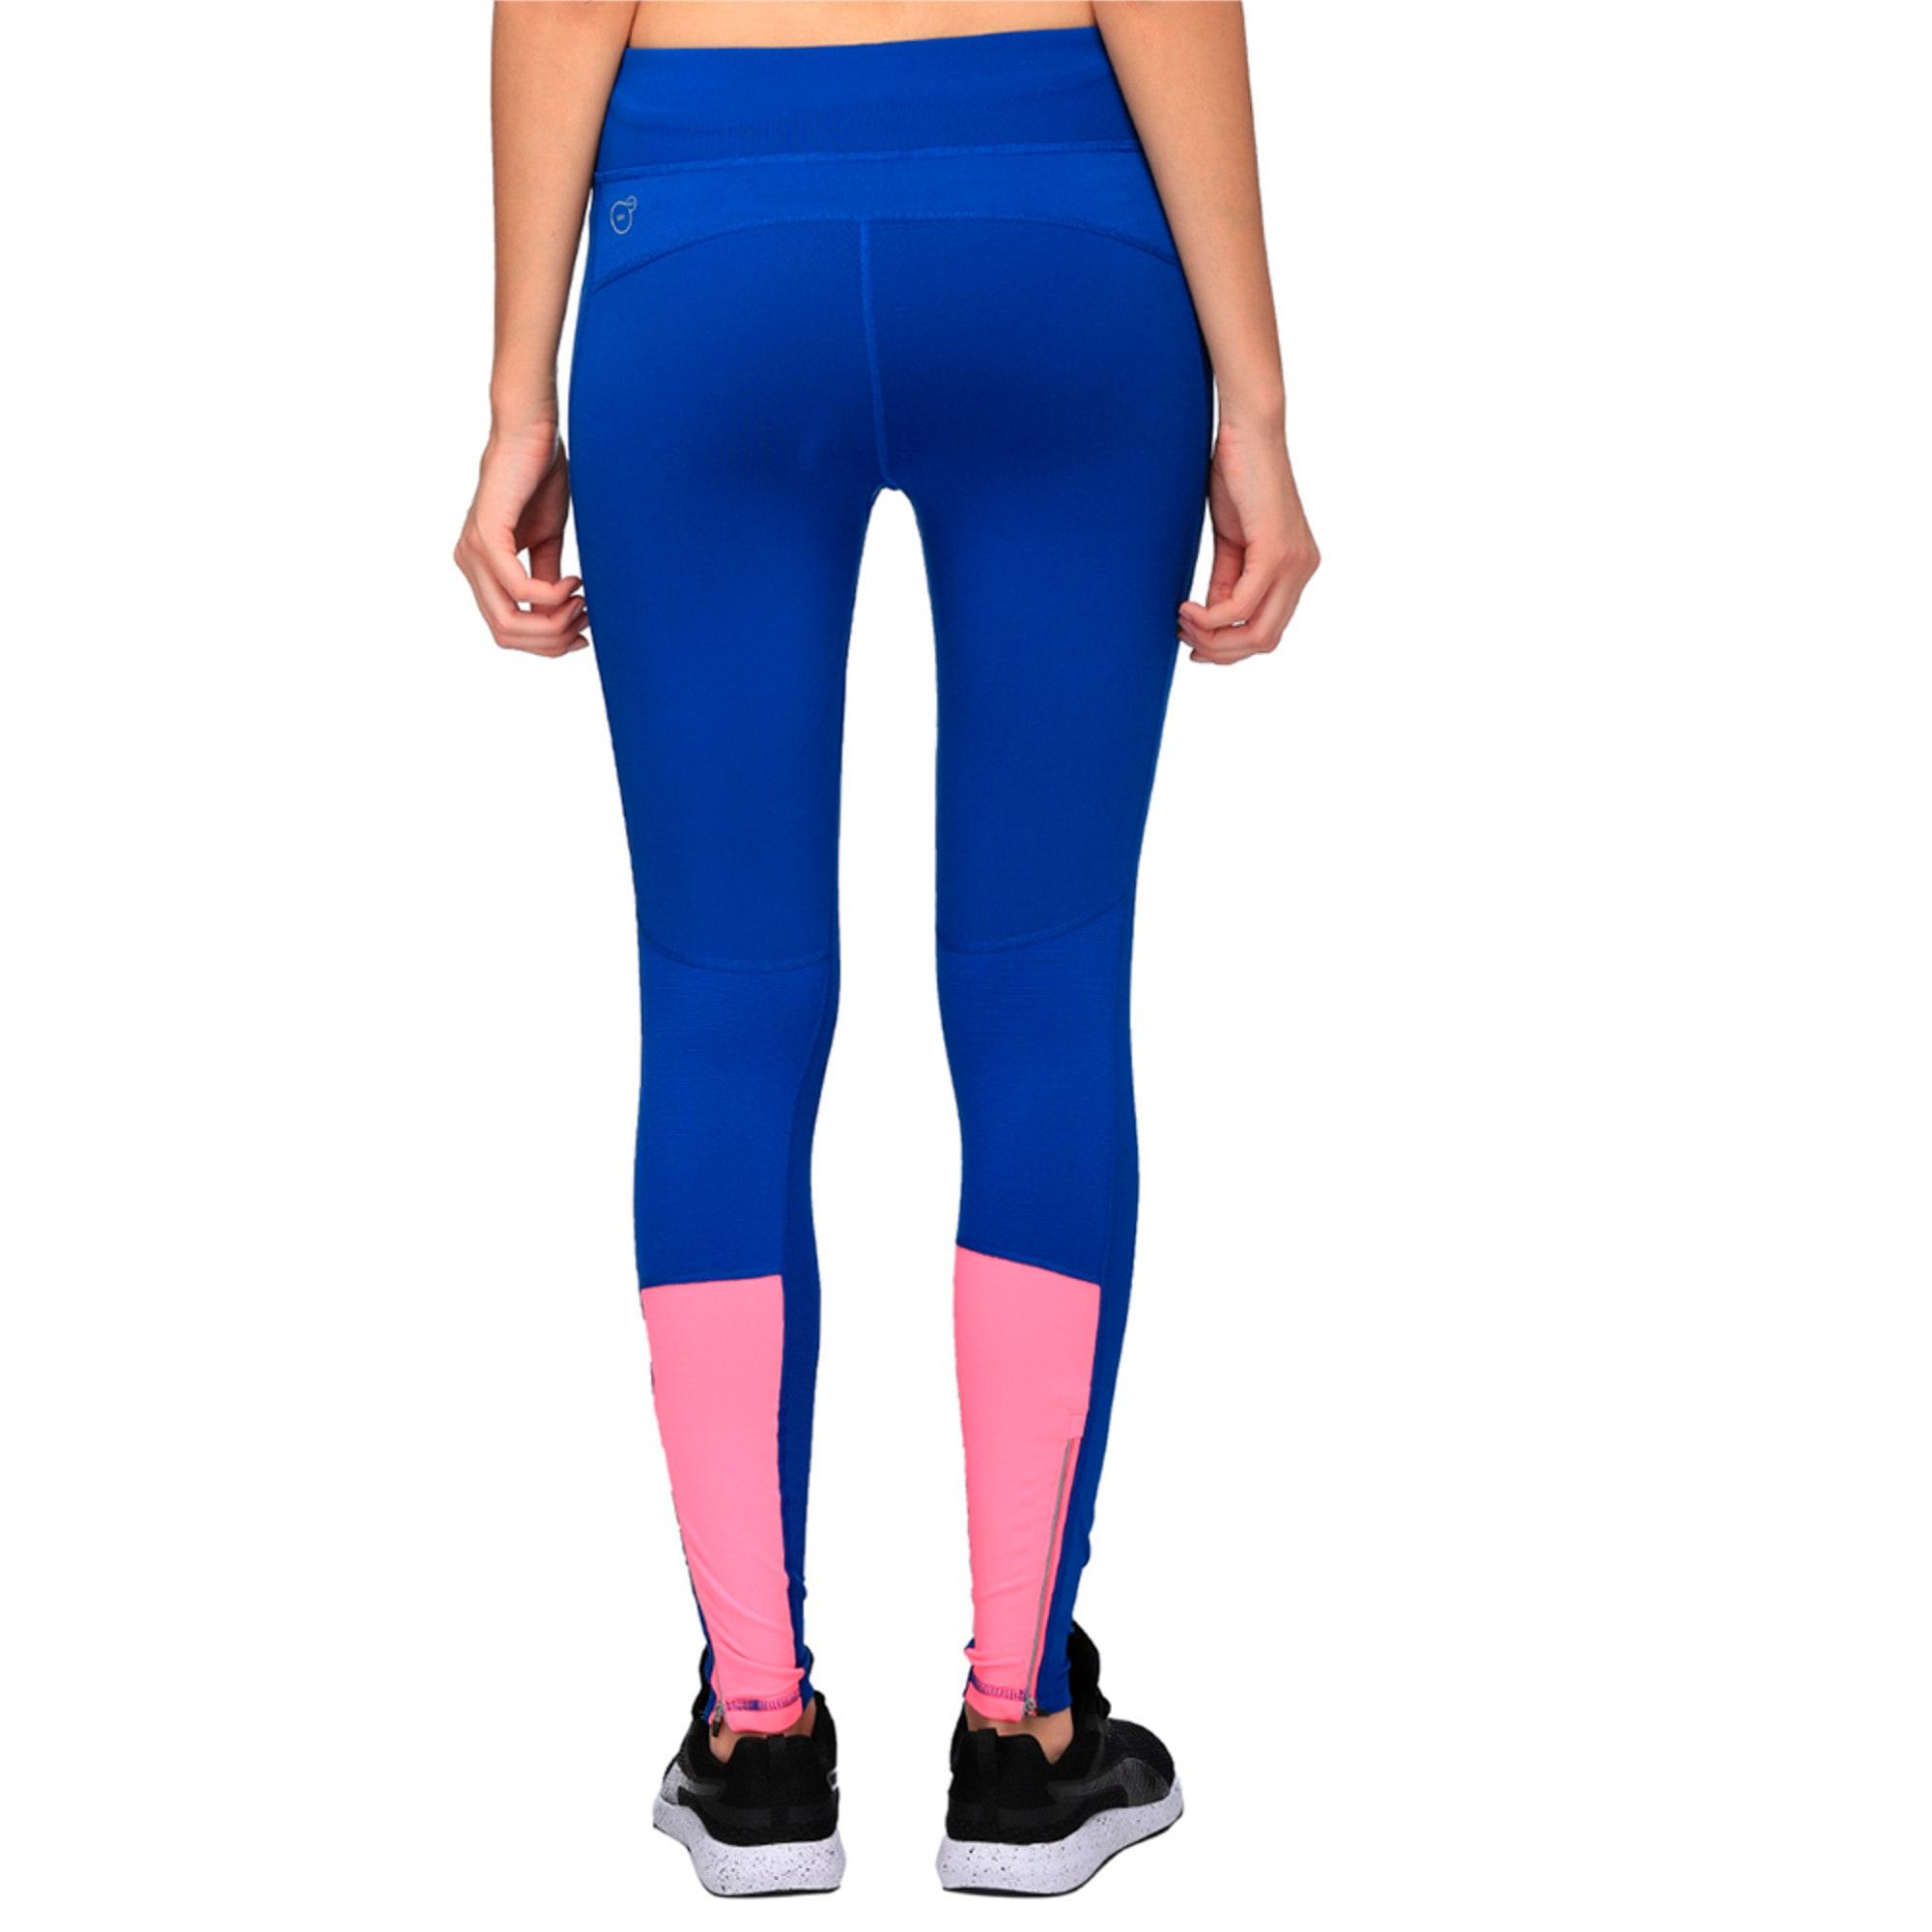 Thumbnail 4 of Running Women's Tights, TRUE BLUE-KNOCKOUT PINK, medium-IND